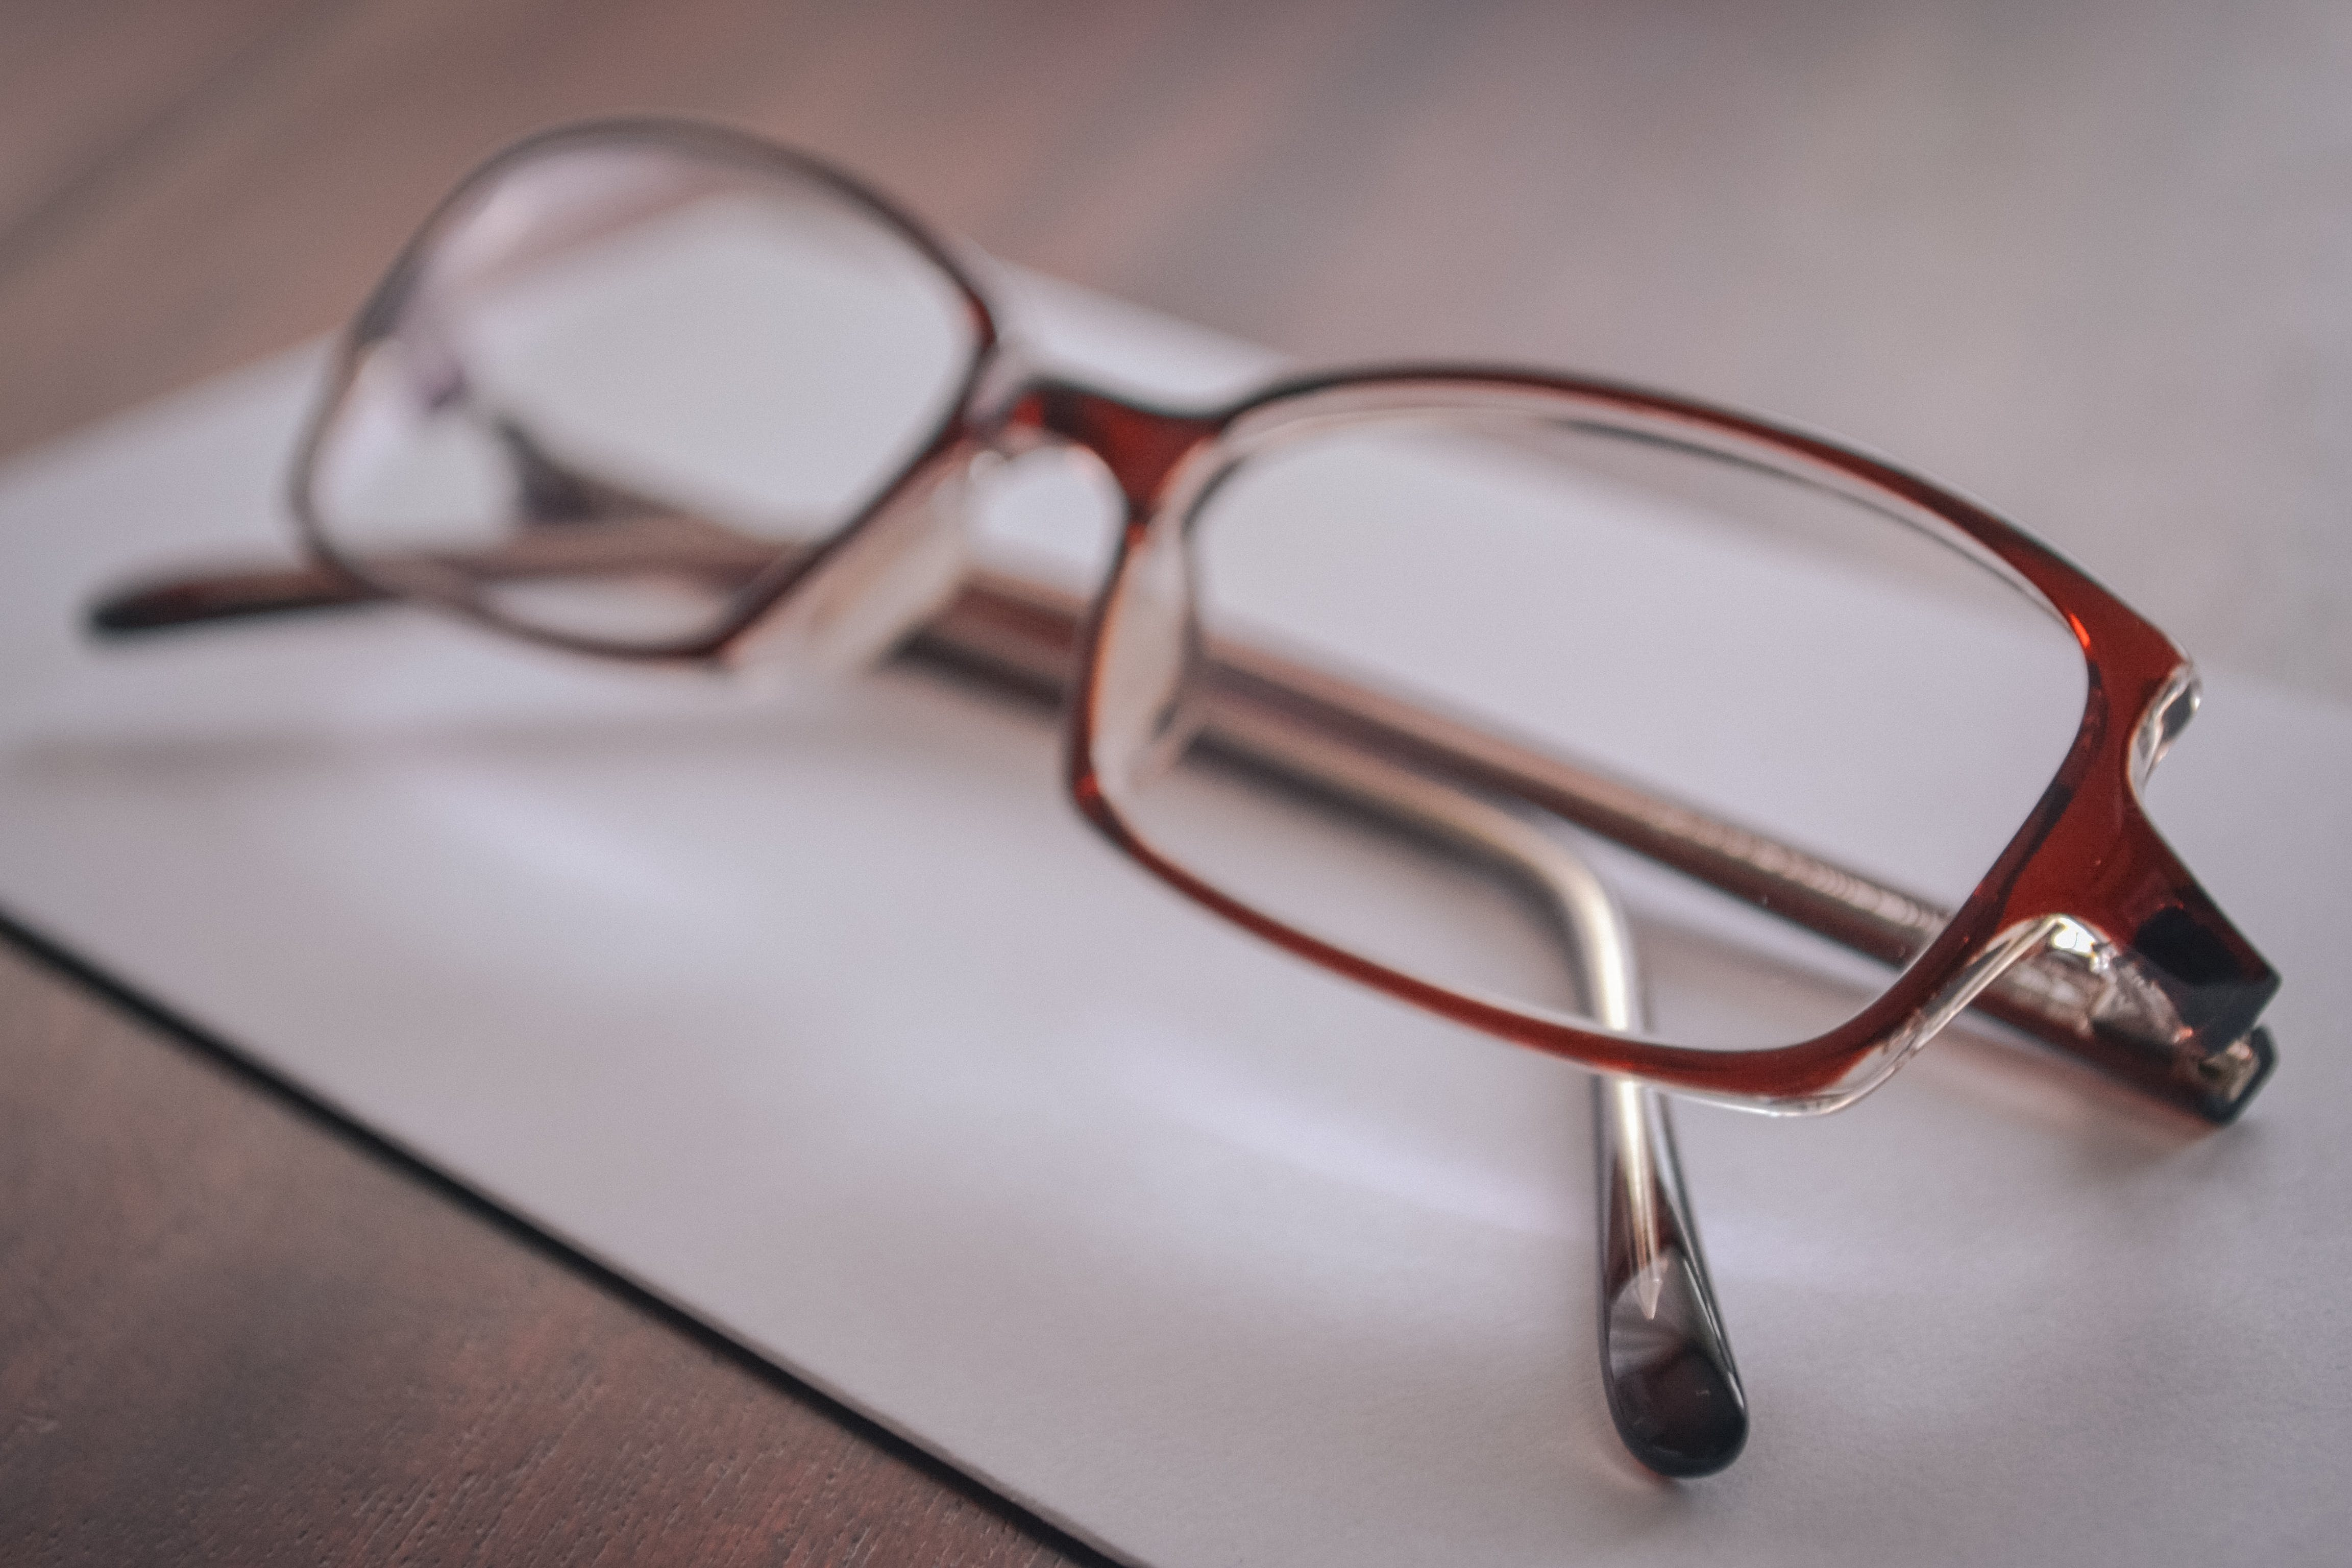 Eyeglasses on Paper